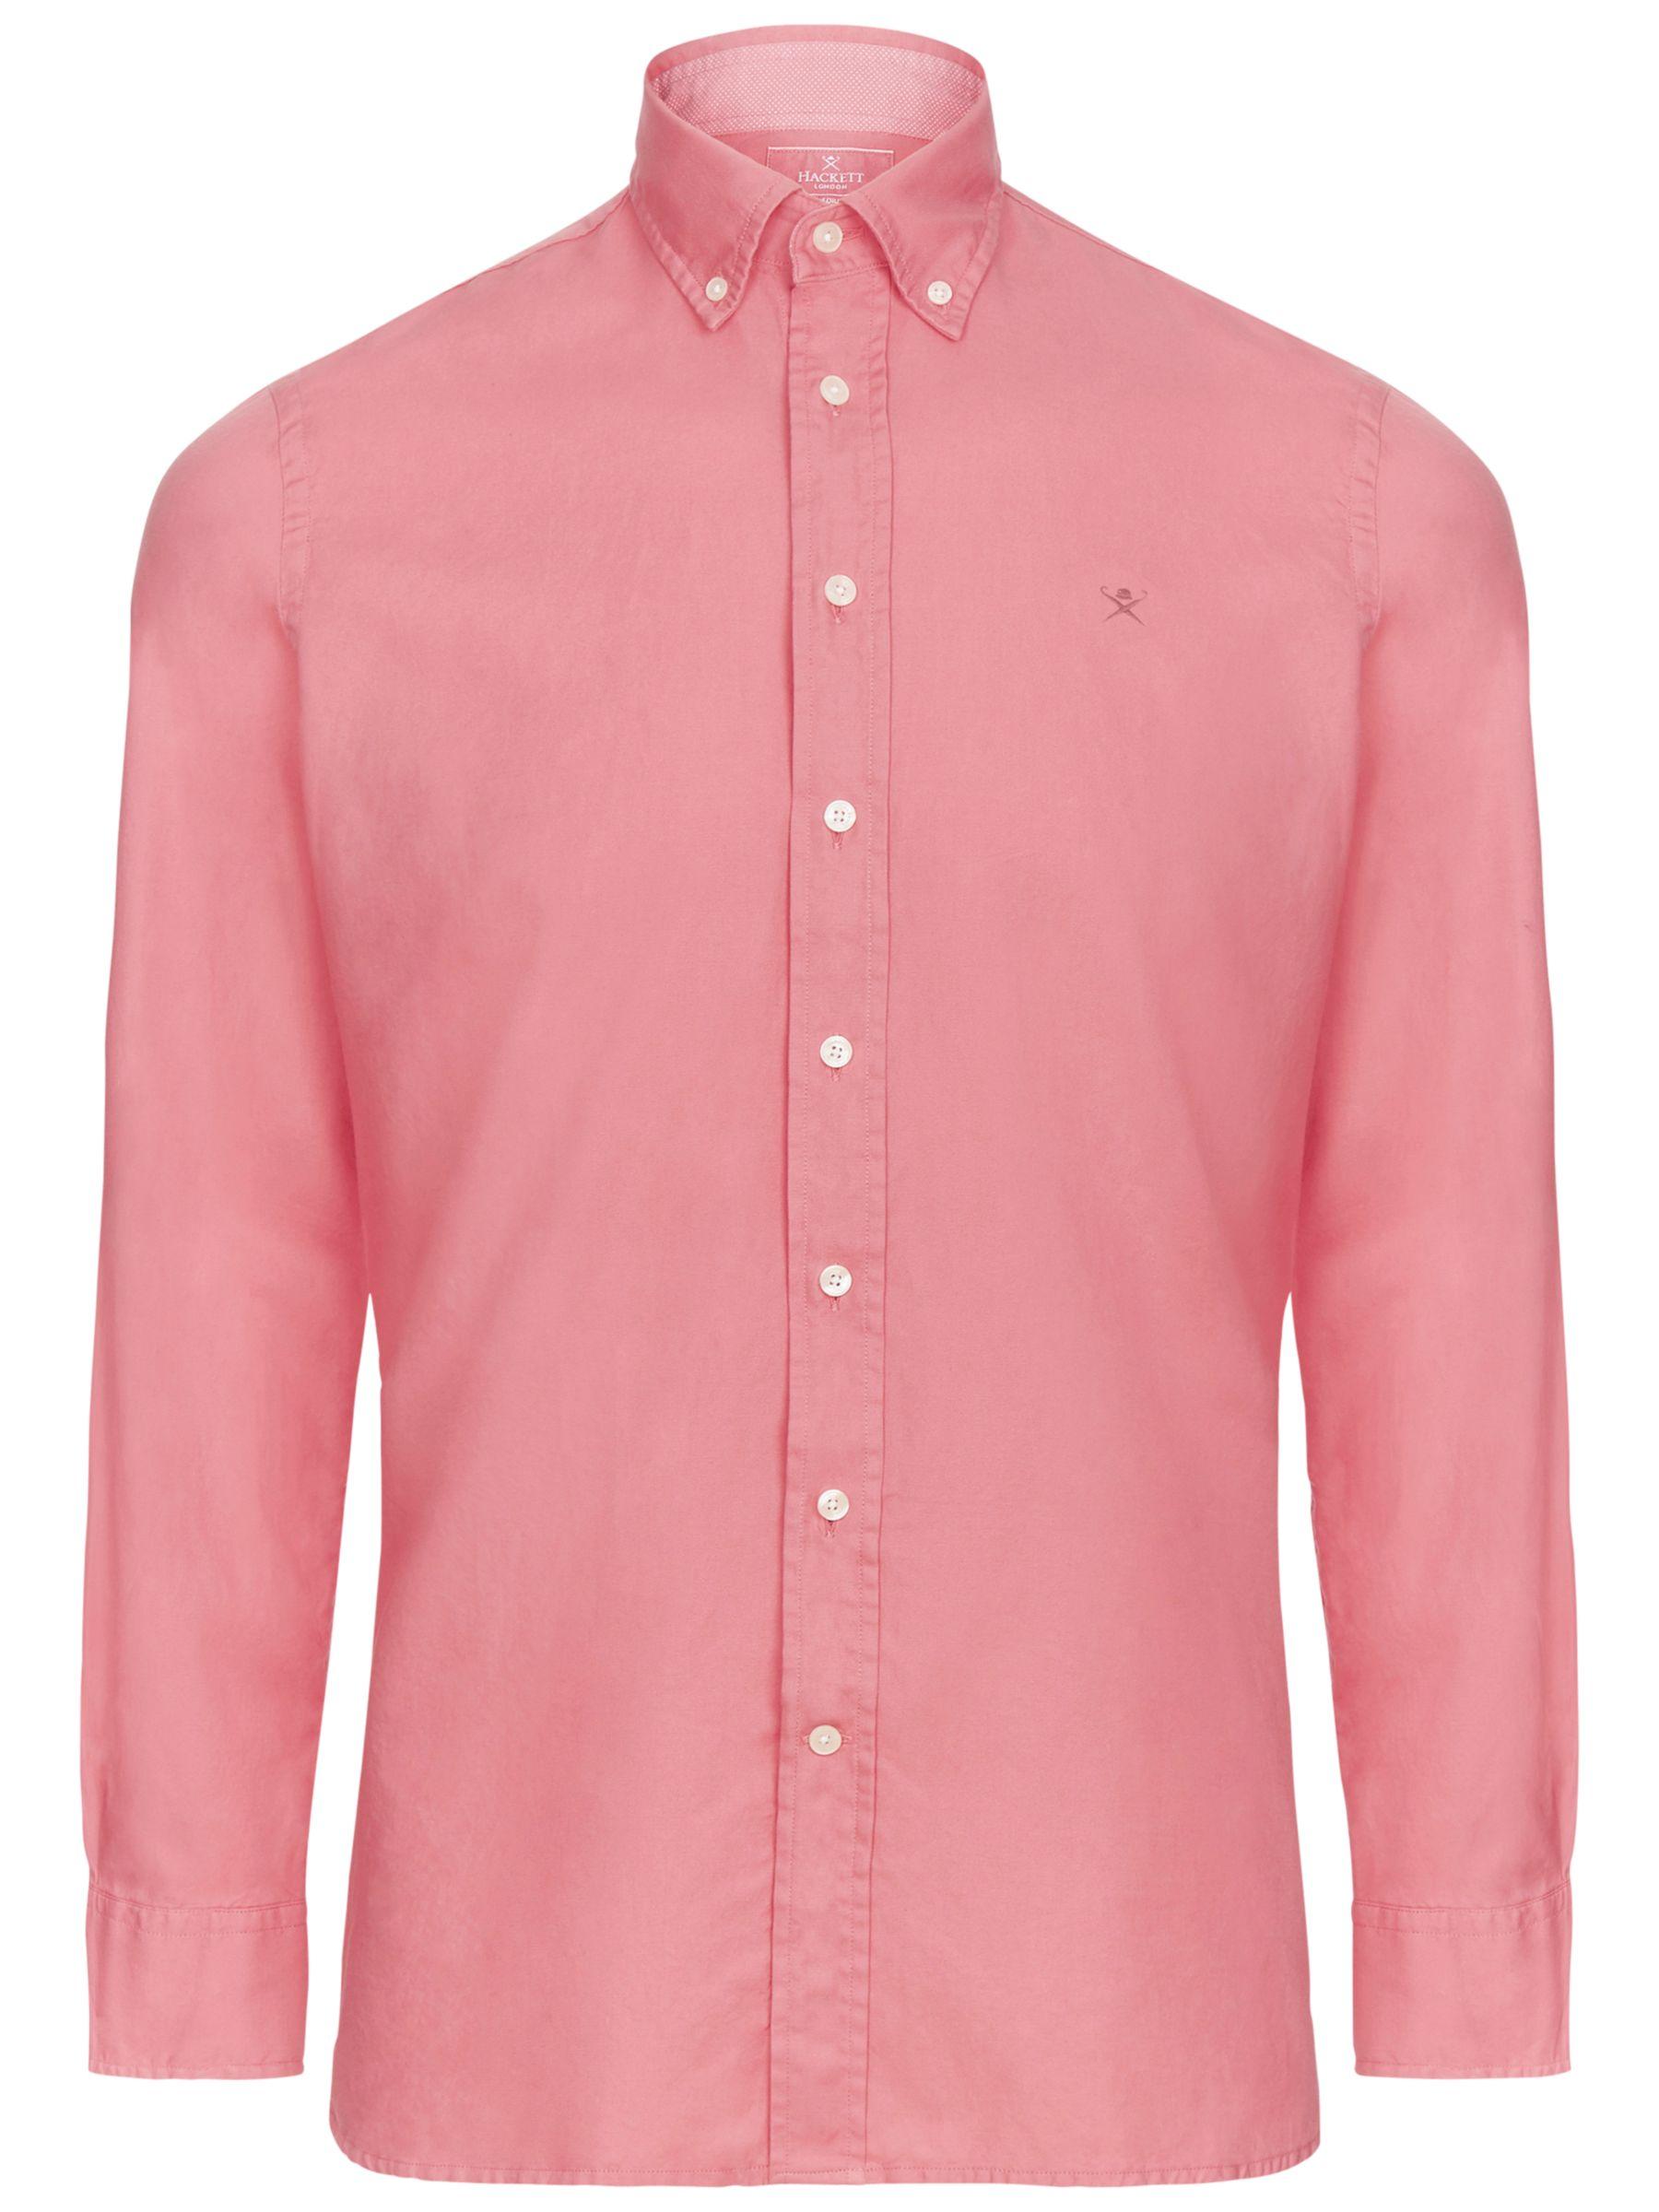 Hackett London Hackett London Brompton Garment Dyed Slim Oxford Shirt, Dark Rose